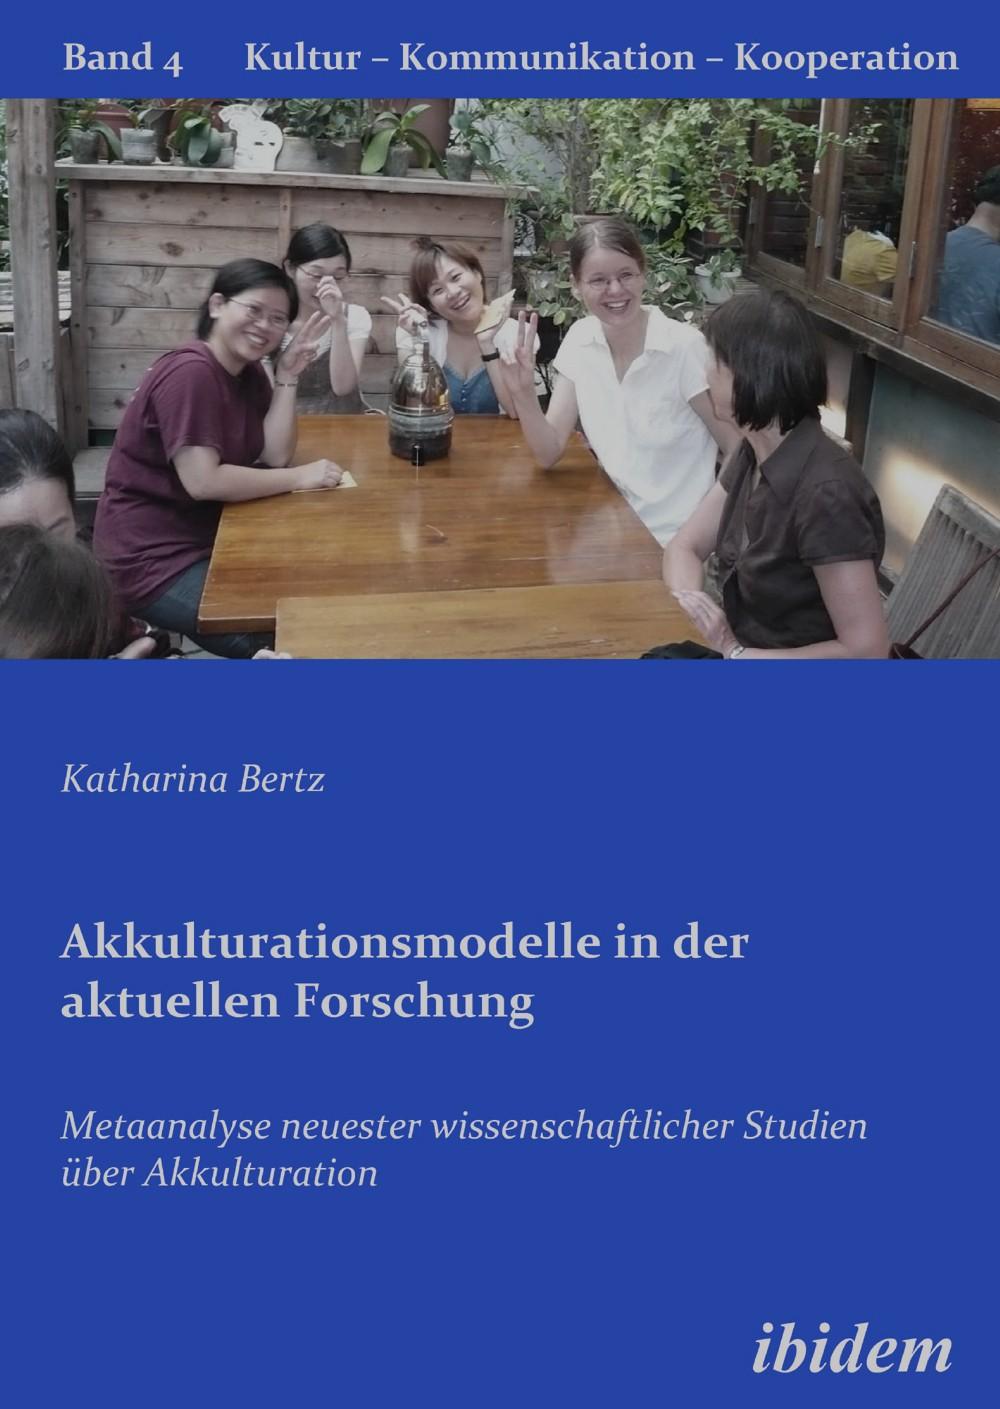 Akkulturationsmodelle in der aktuellen Forschung